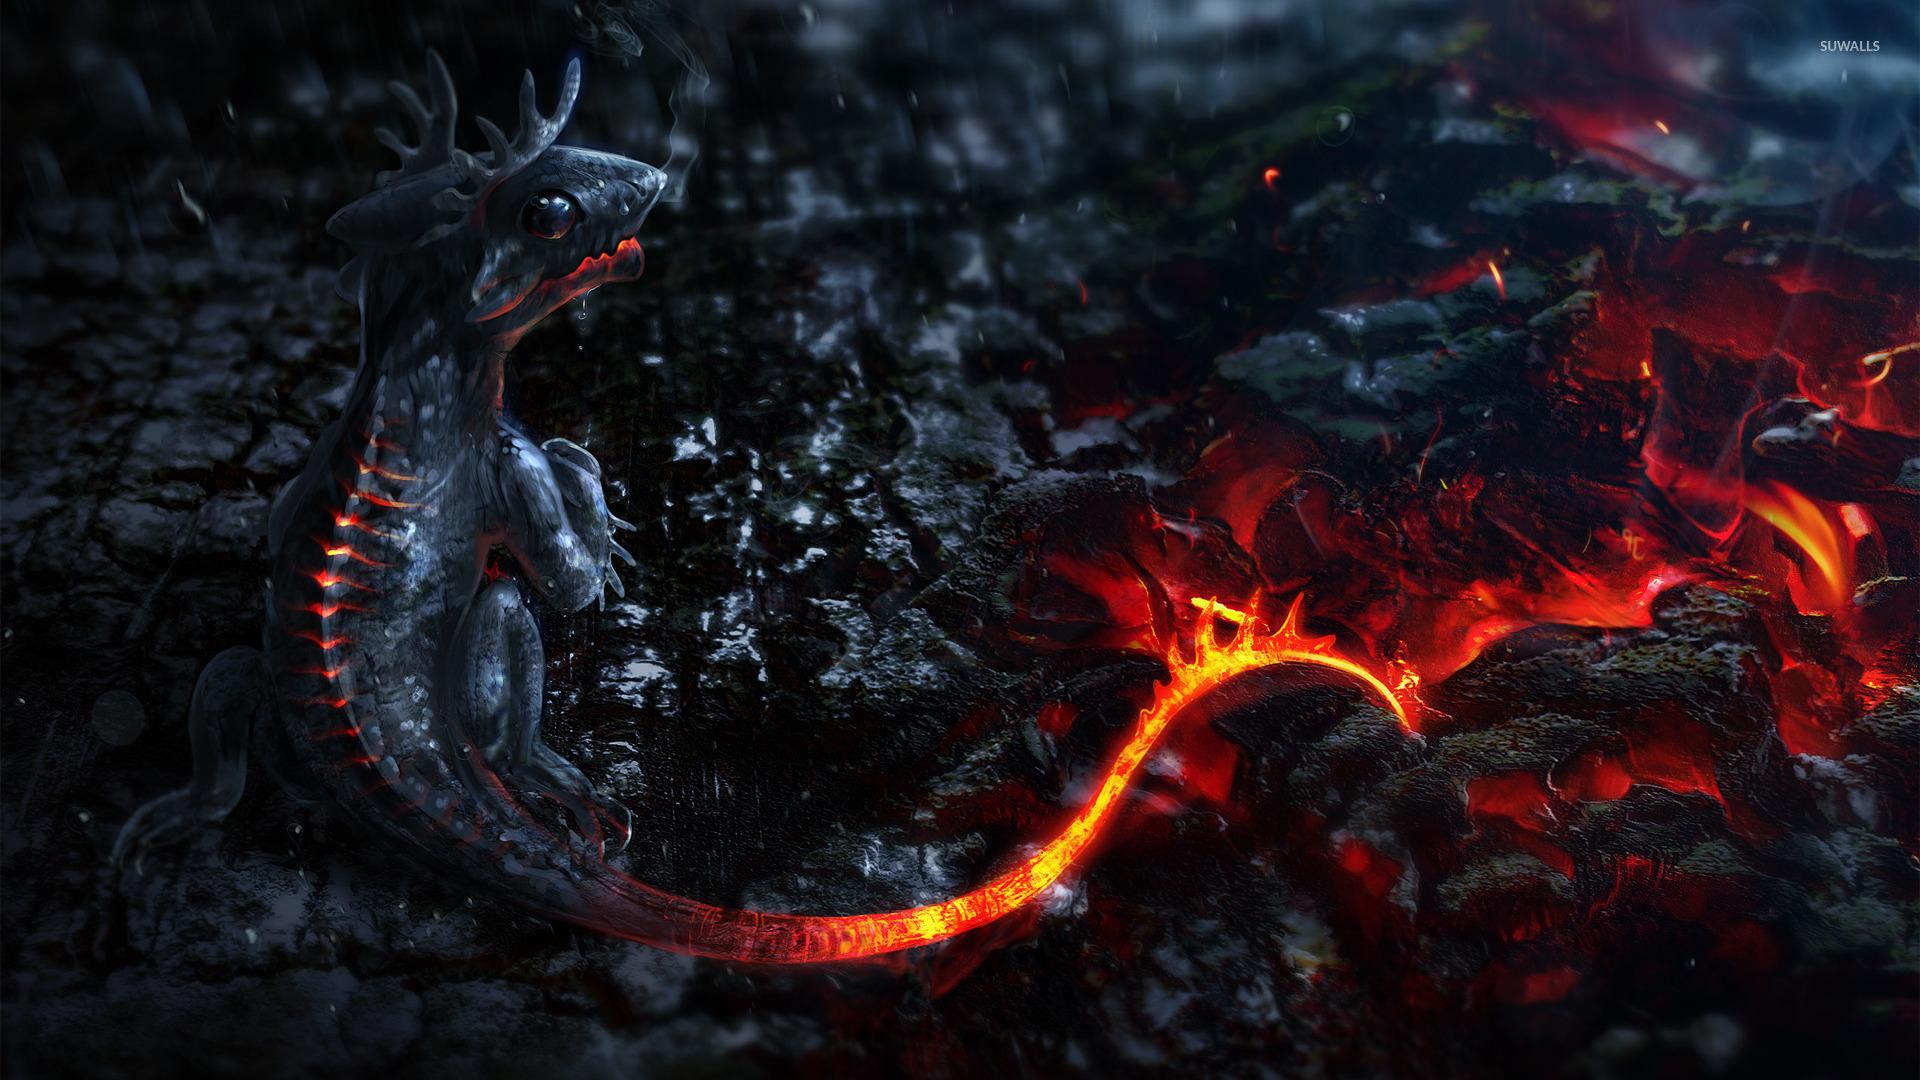 Lava dragon wallpaper   801618 1920x1080